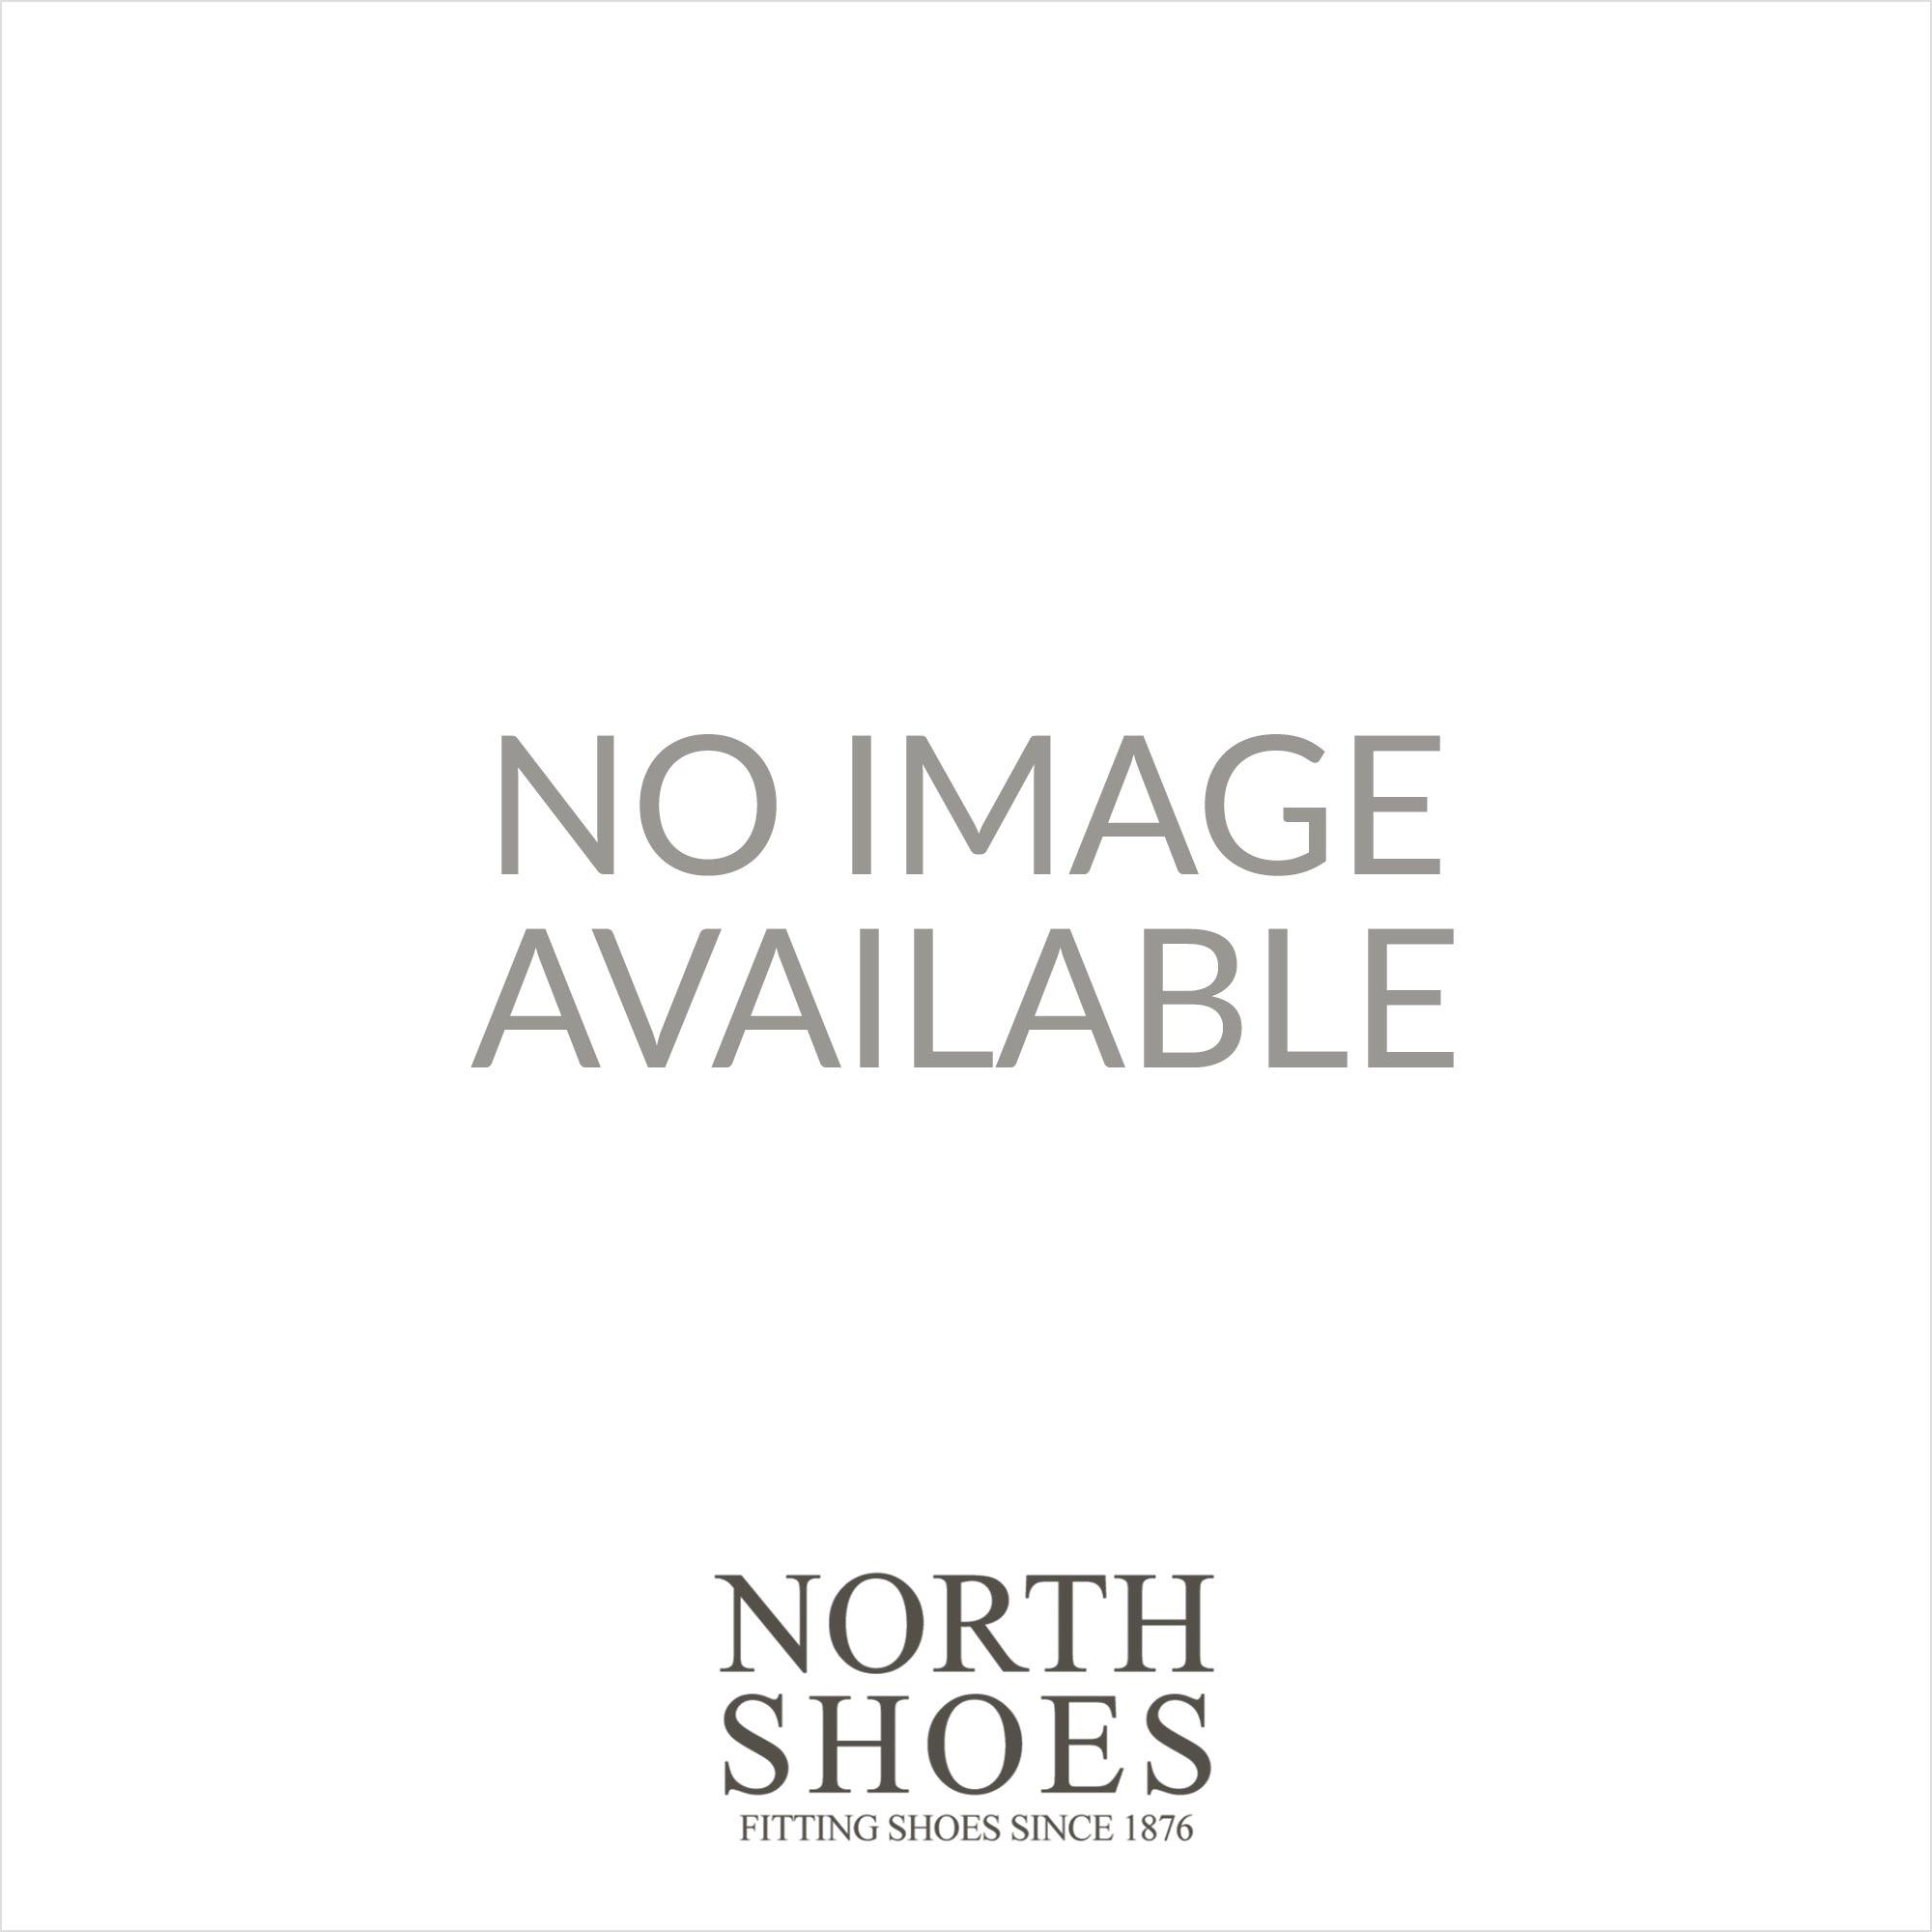 12c518e65a2 Toni Pons Tarbes Black Striped Canvas Womens Wedge Espadrille Shoes